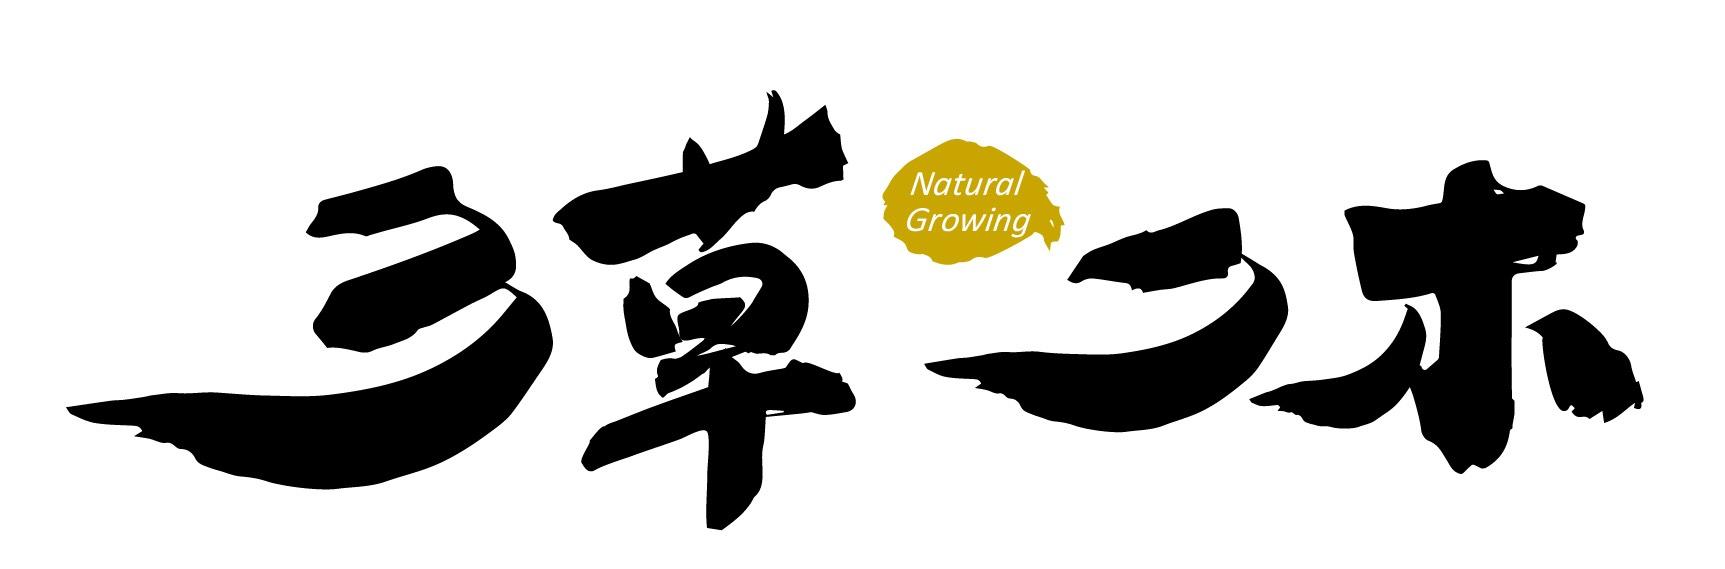 190103 Logo (1).jpg